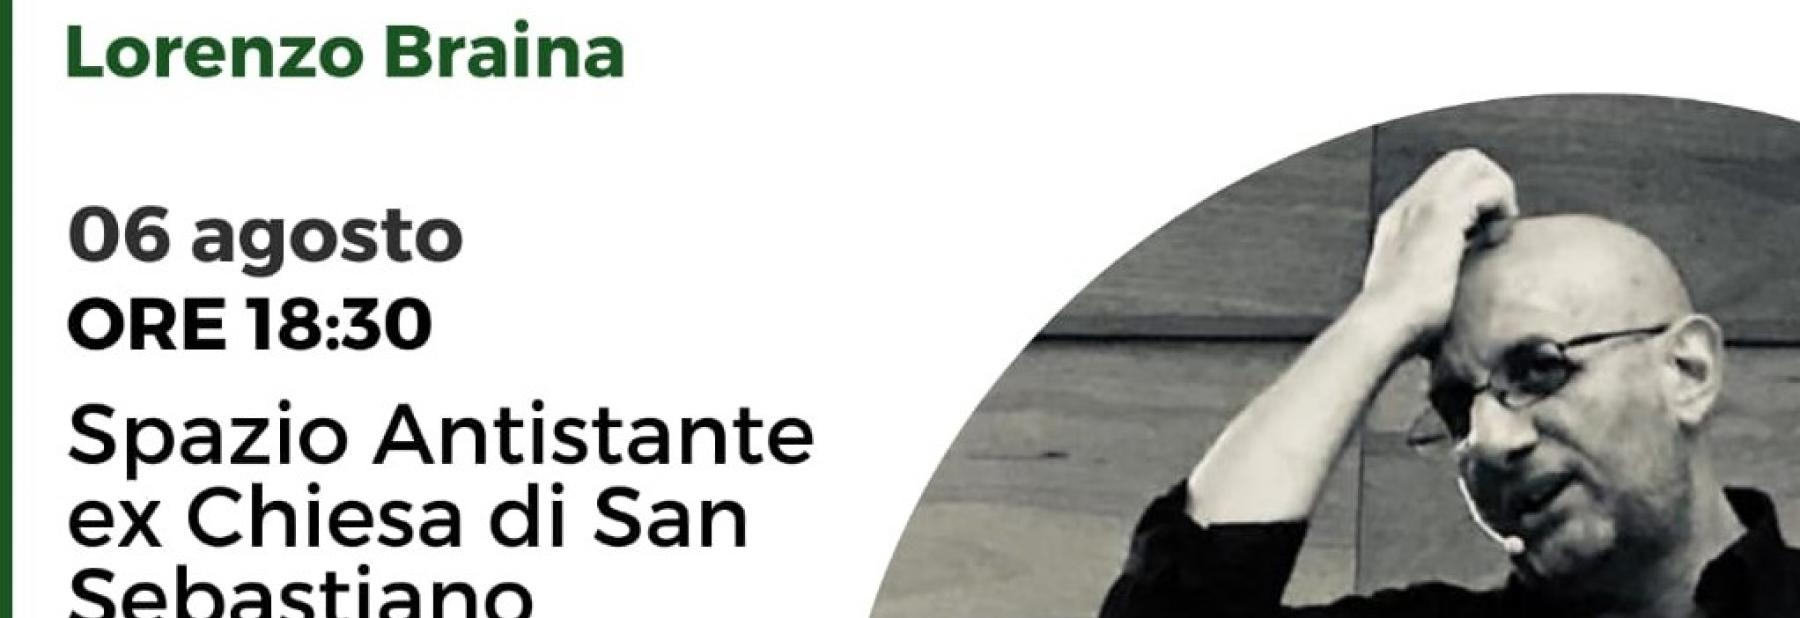 ritaglio_locandina_braina